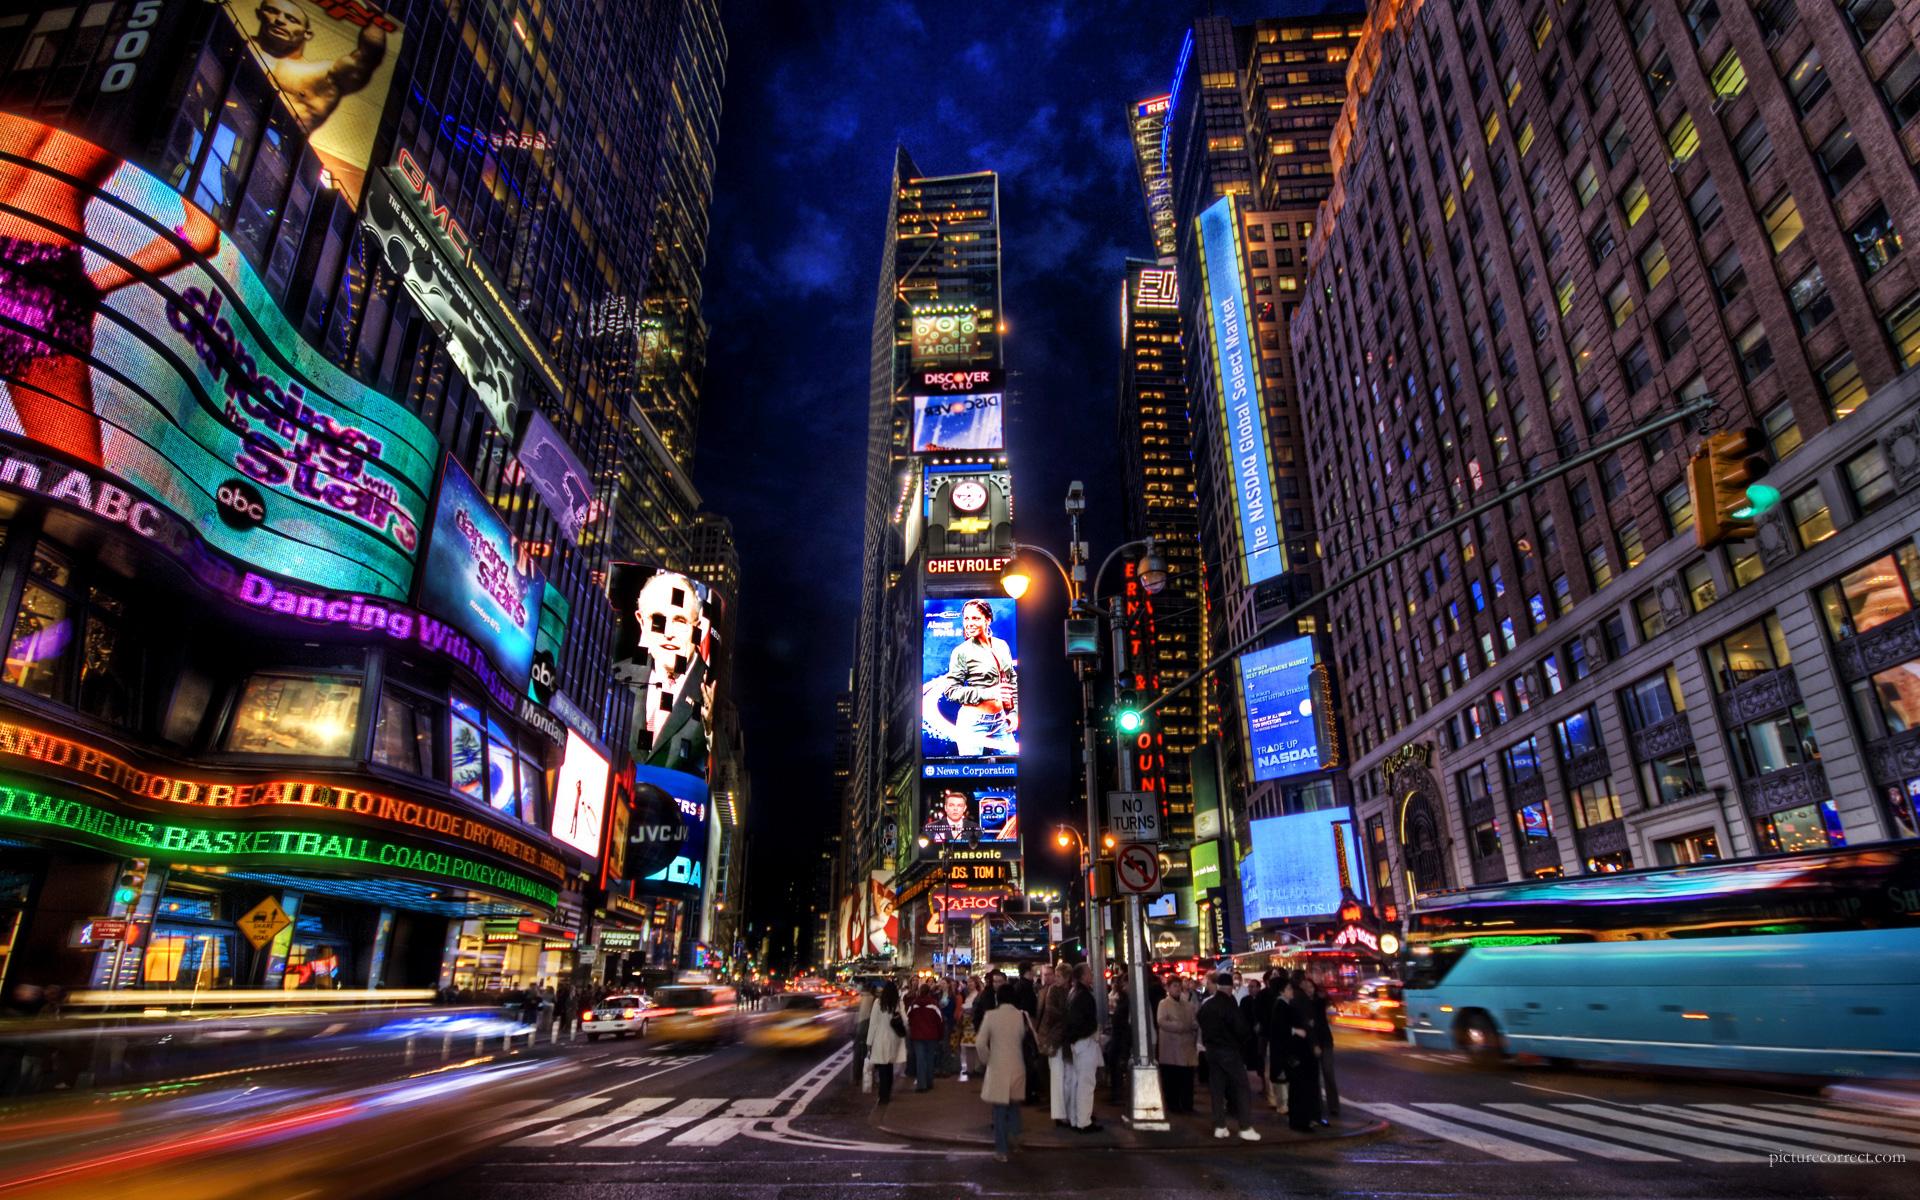 Times Square Wallpaper 002. 1280 x 1024